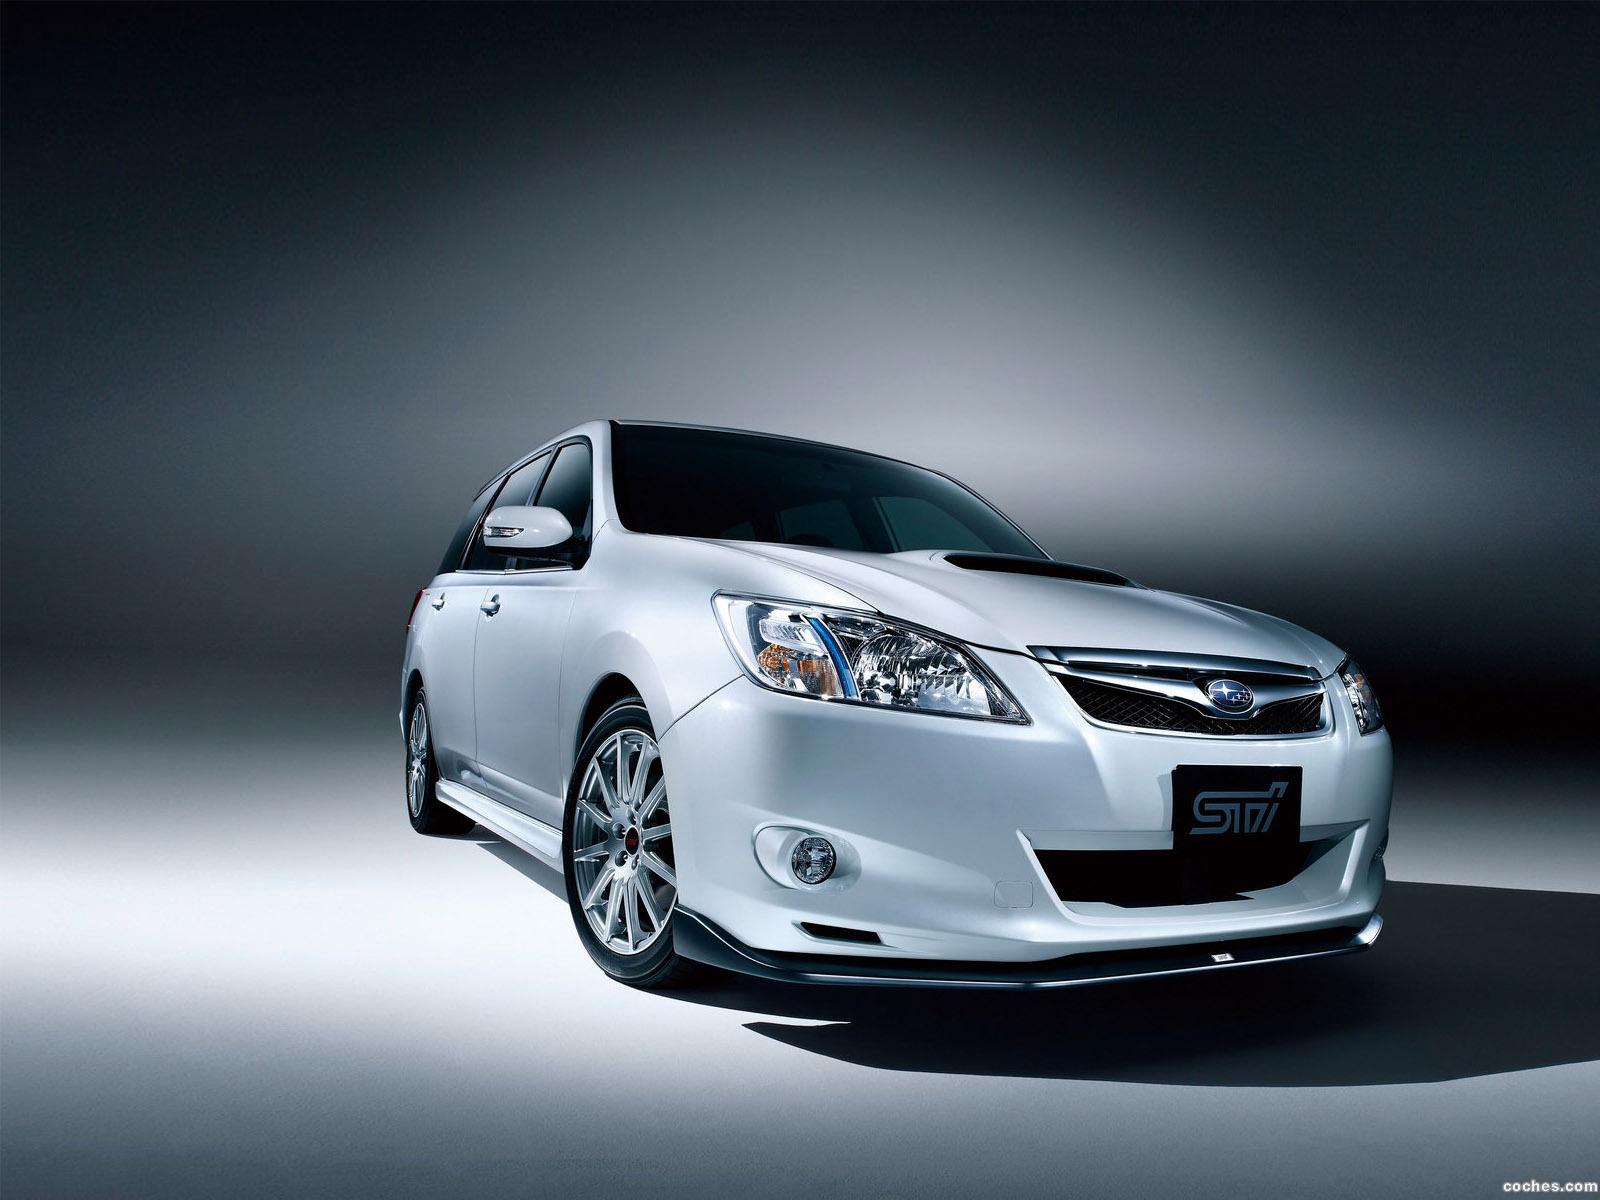 Fotos De Subaru 2 0 Gt Sti 2009